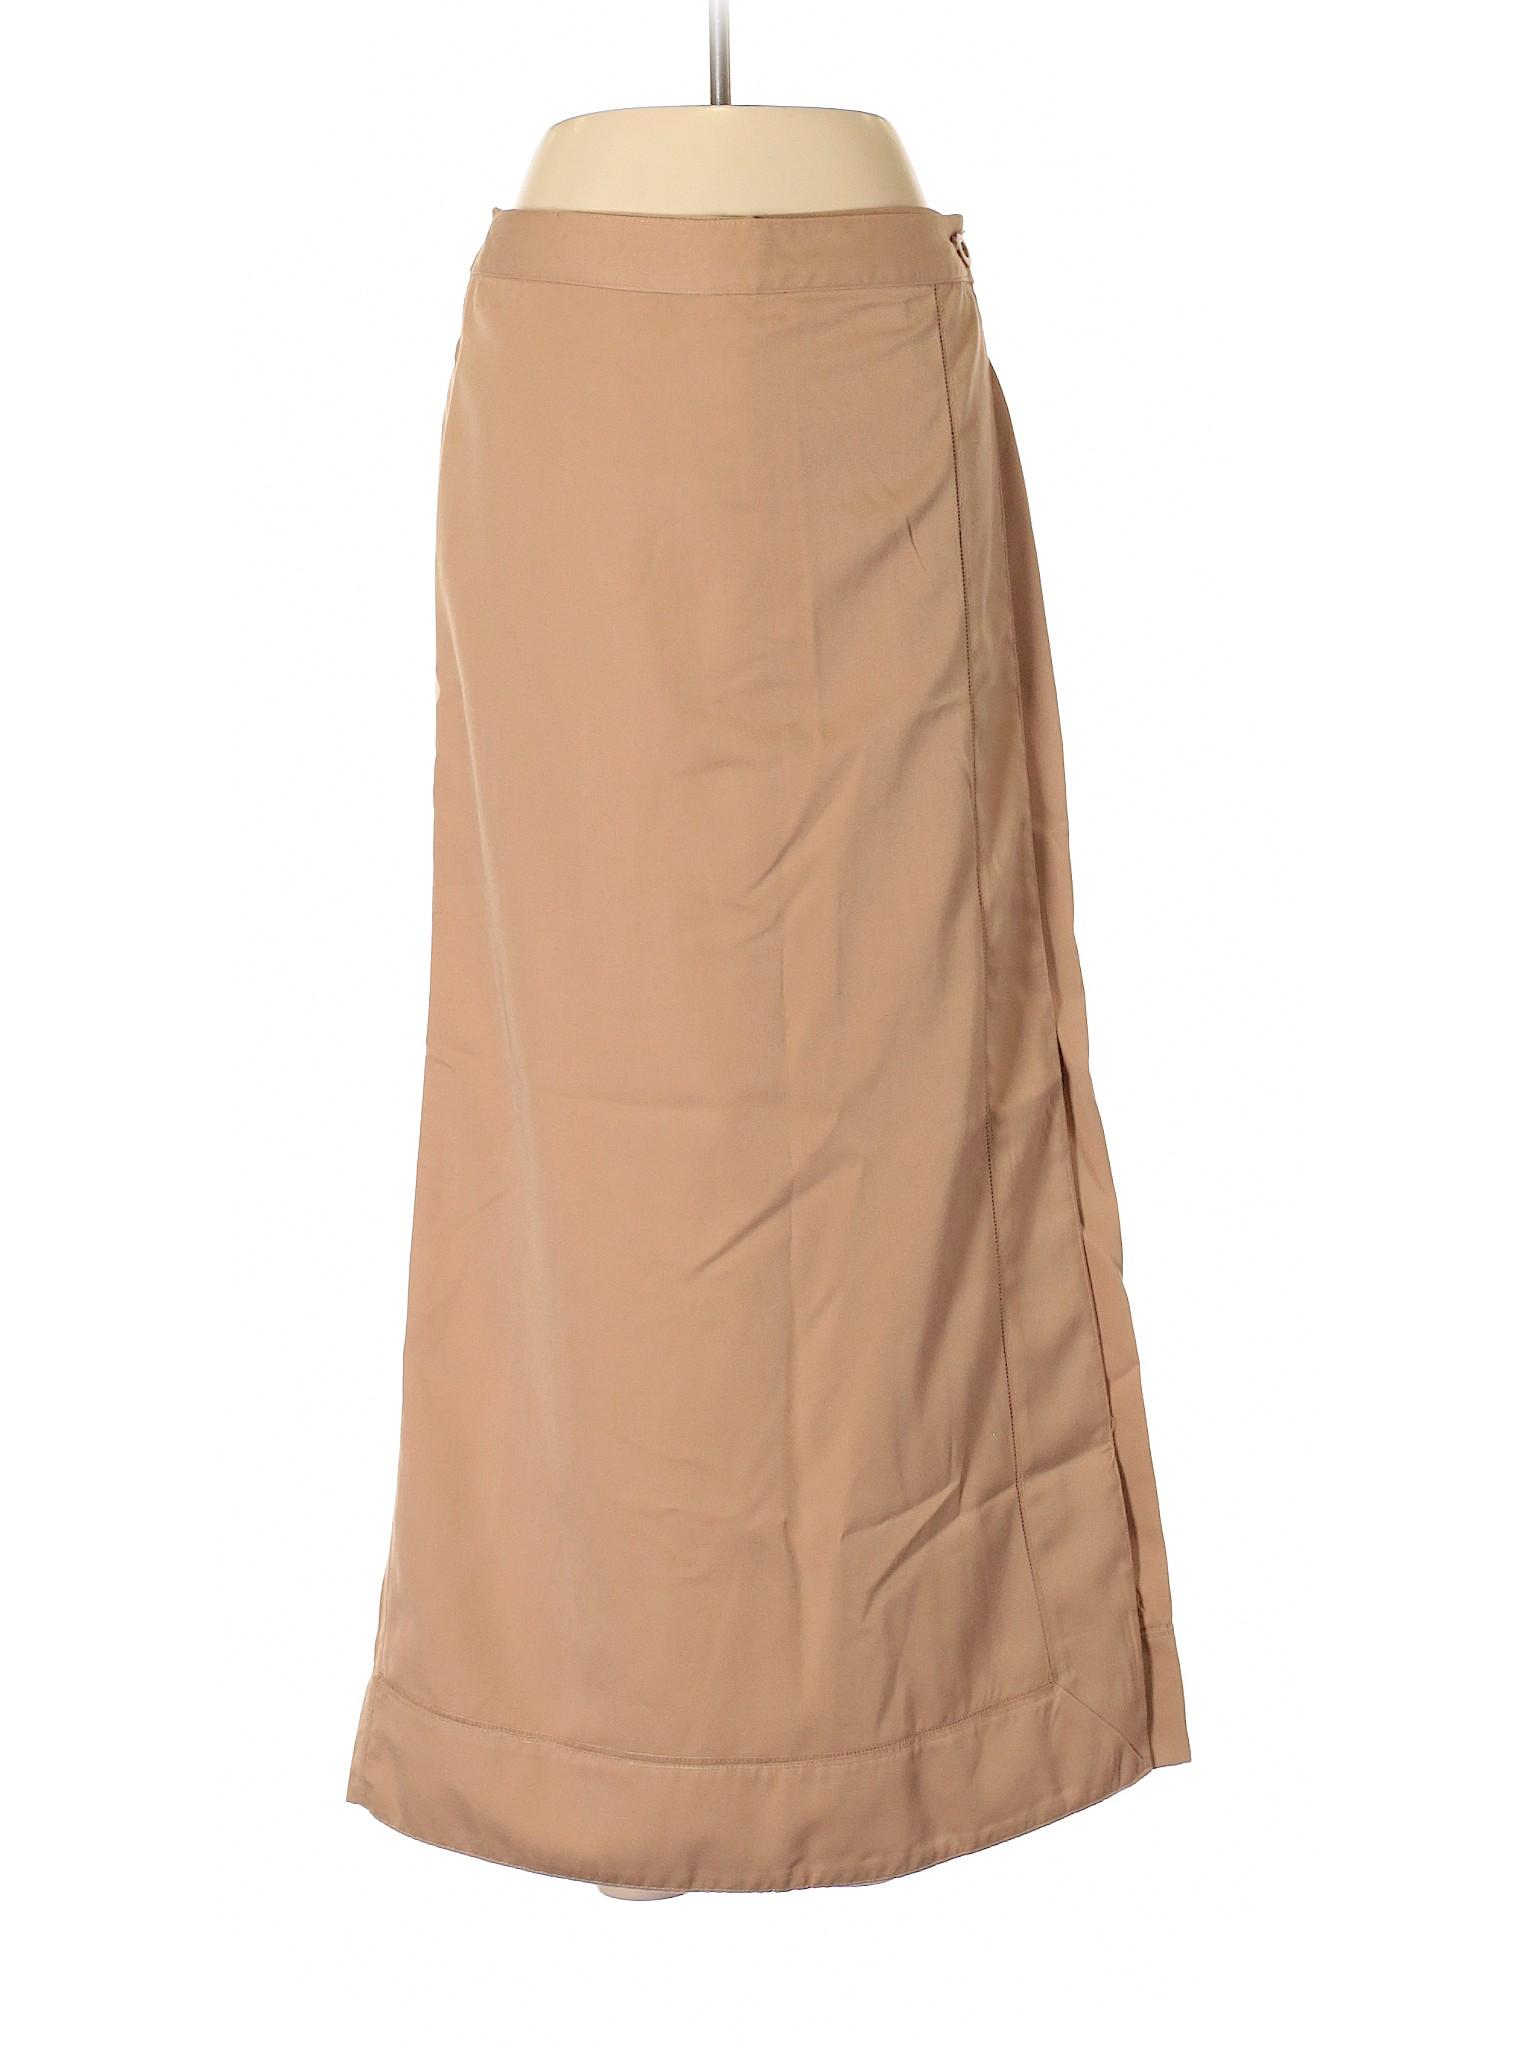 Dress Leisure Leisure Leisure winter Dress Pants Chadwicks winter Pants Chadwicks winter qwYxt57